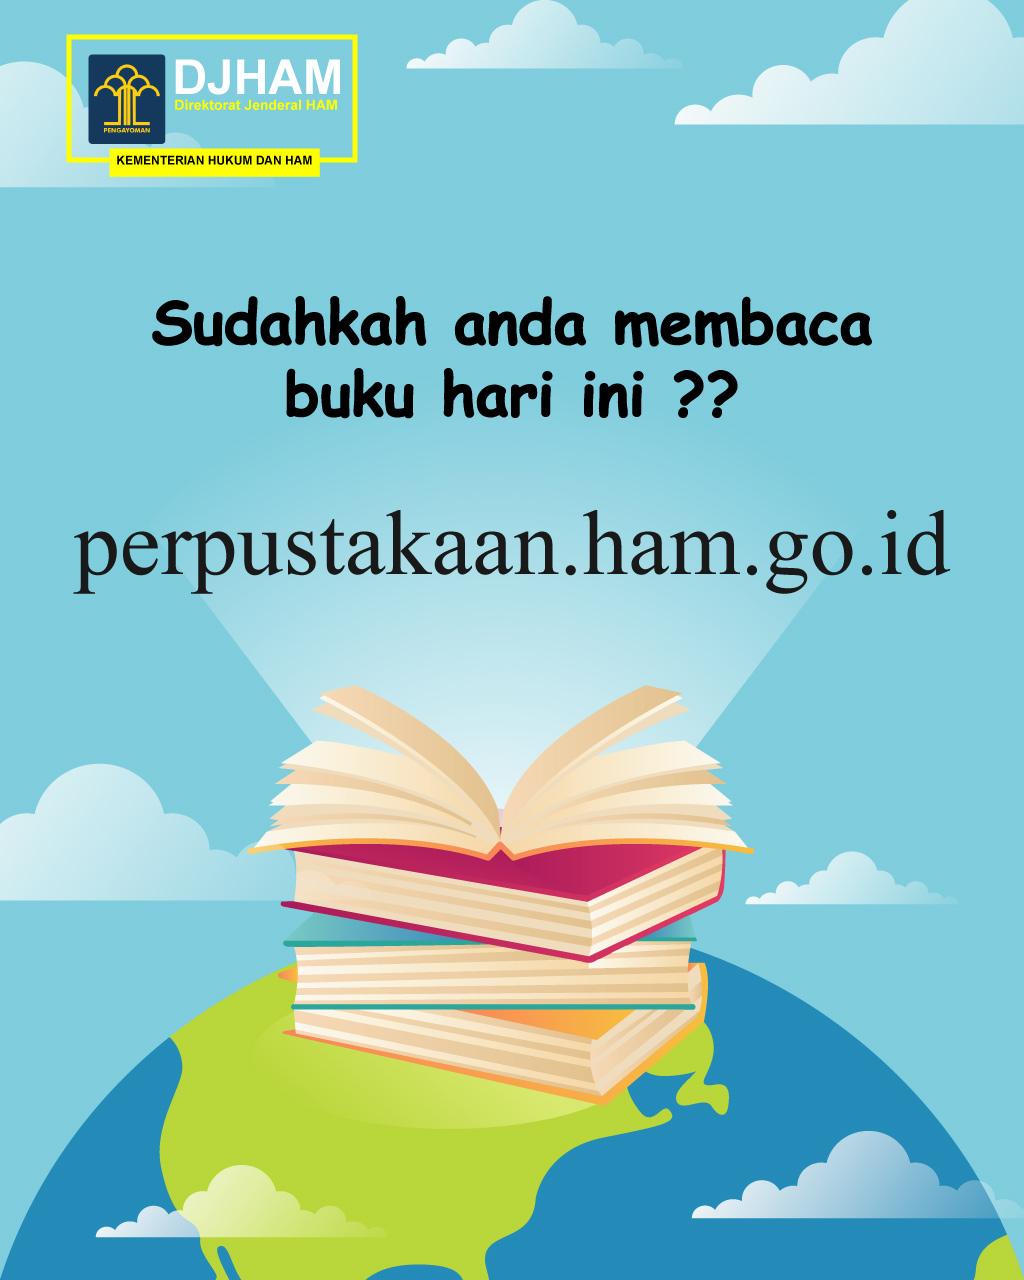 perpustakaan.ham.go.id